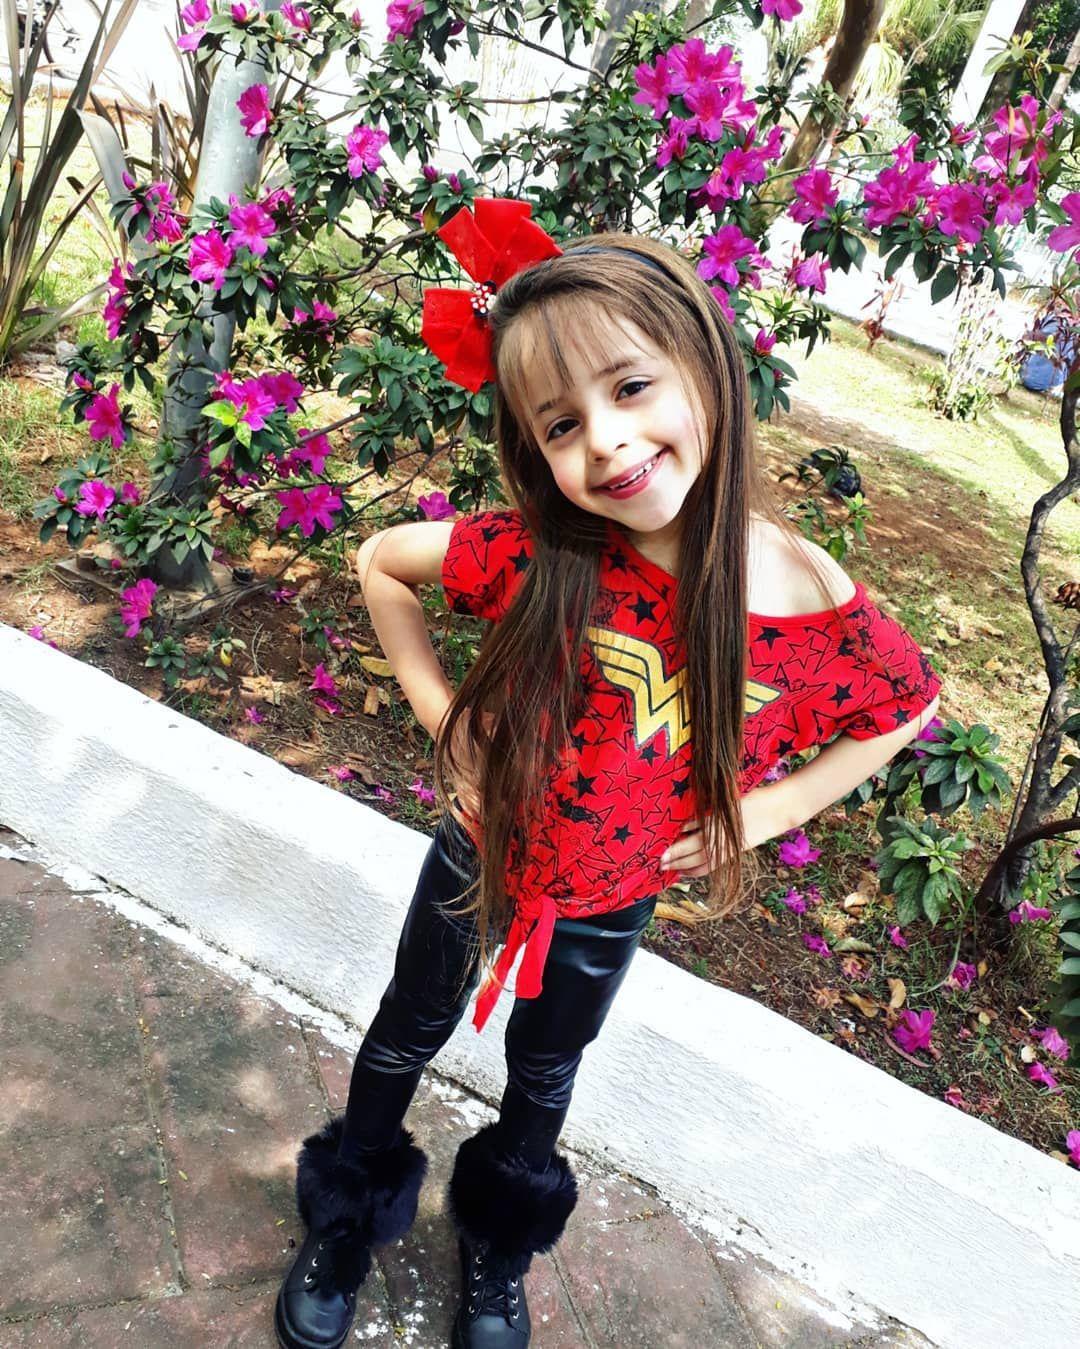 #baby #love #family Um final de semana cheio de amor para vocs ......#mundorosa #maedemenina #babygirl #maternidade #princesa #fashion #baby #mundoazul #love #maternidadereal #modainfantil #kids #lookdodia #maedeprimeiraviagem #menina #minifashionista #instababy #moda #lojainfantil #laos #maedeprincesa #bebe #minidiva #meninas #instakids #blogueirinha #maedemenino #fashionkids #crianas #cute